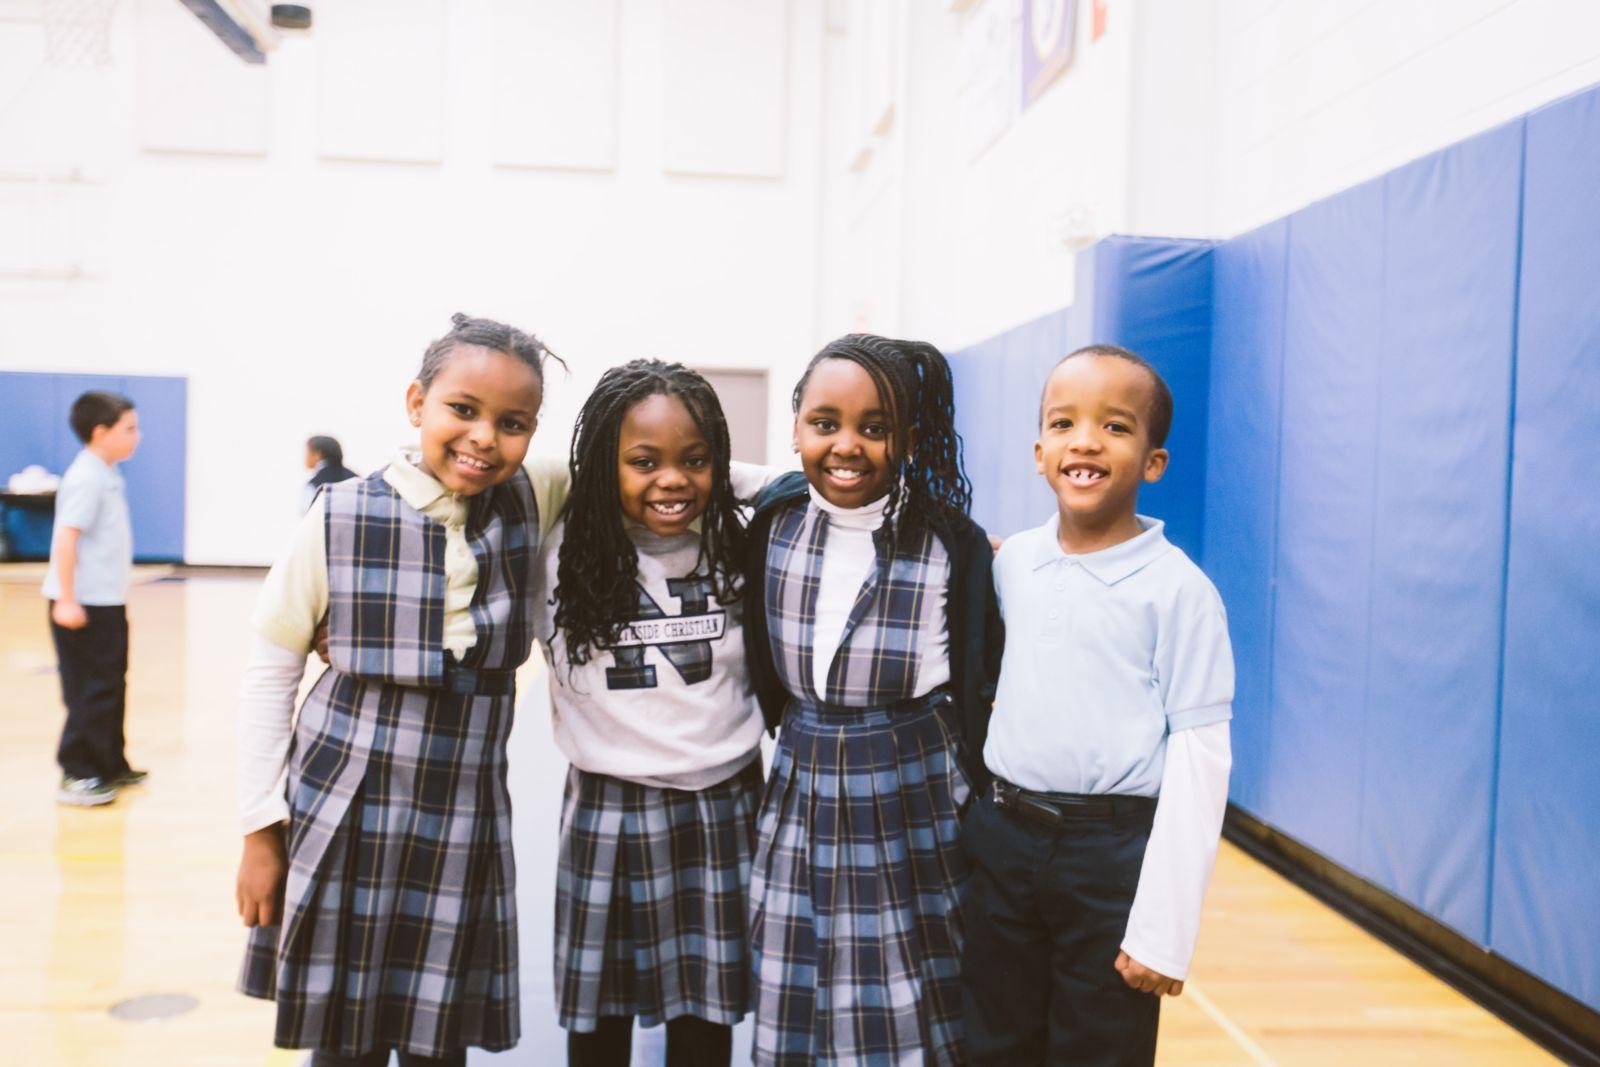 Elementary Uniforms